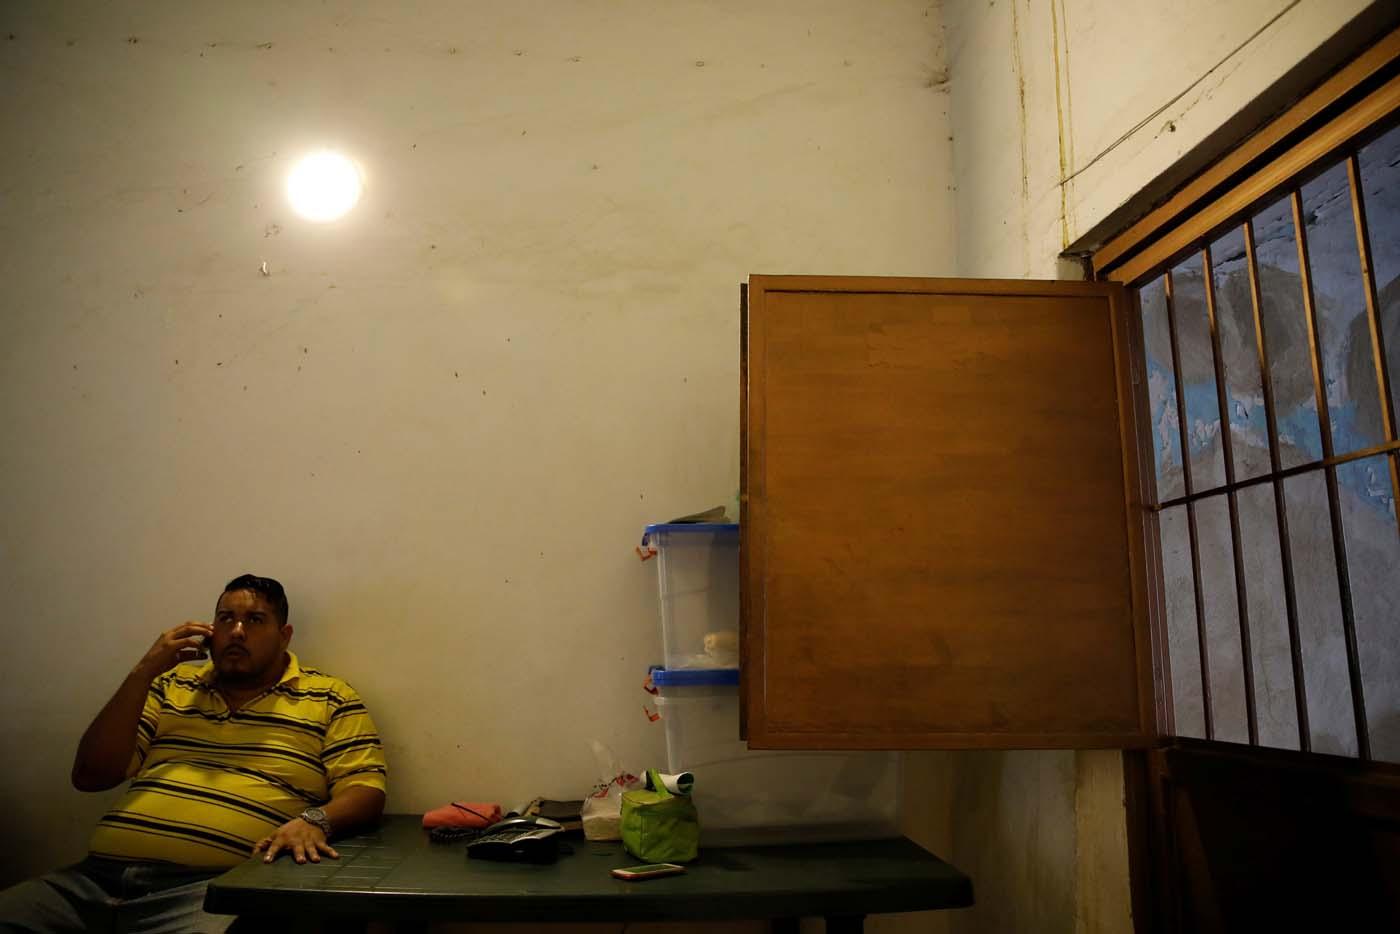 Medical equipment repairman Leandro Colmenares speaks by phone at his house in Caracas, Venezuela October 3, 2017. Picture taken October 3, 2017. REUTERS/Carlos Garcia Rawlins